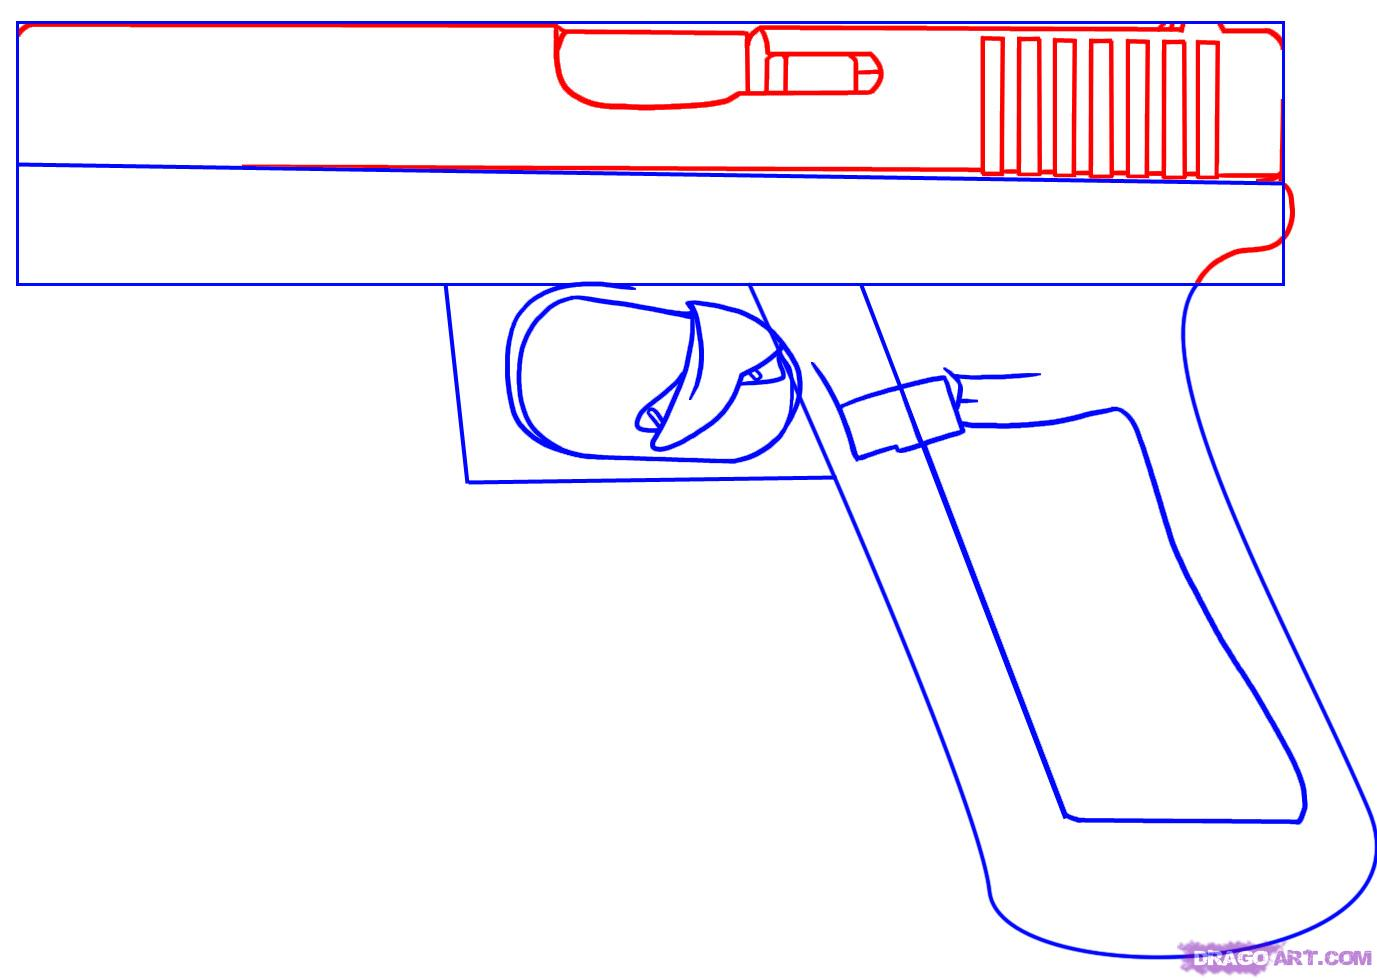 Drawn pistol easy Draw Online Step hand FREE